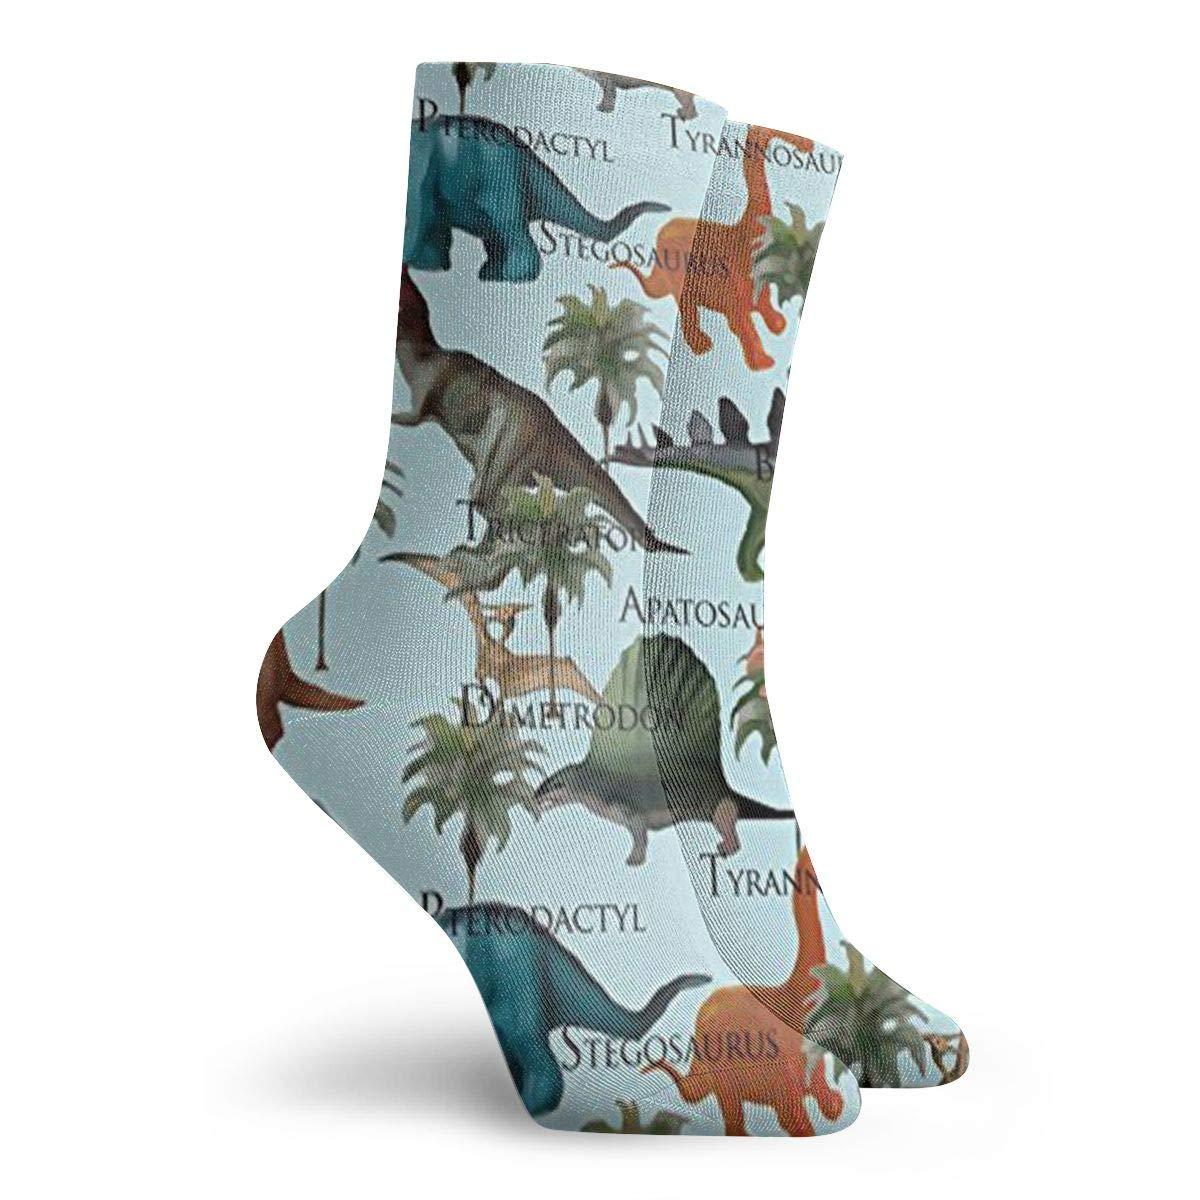 Dinosaurs Unisex Funny Casual Crew Socks Athletic Socks For Boys Girls Kids Teenagers